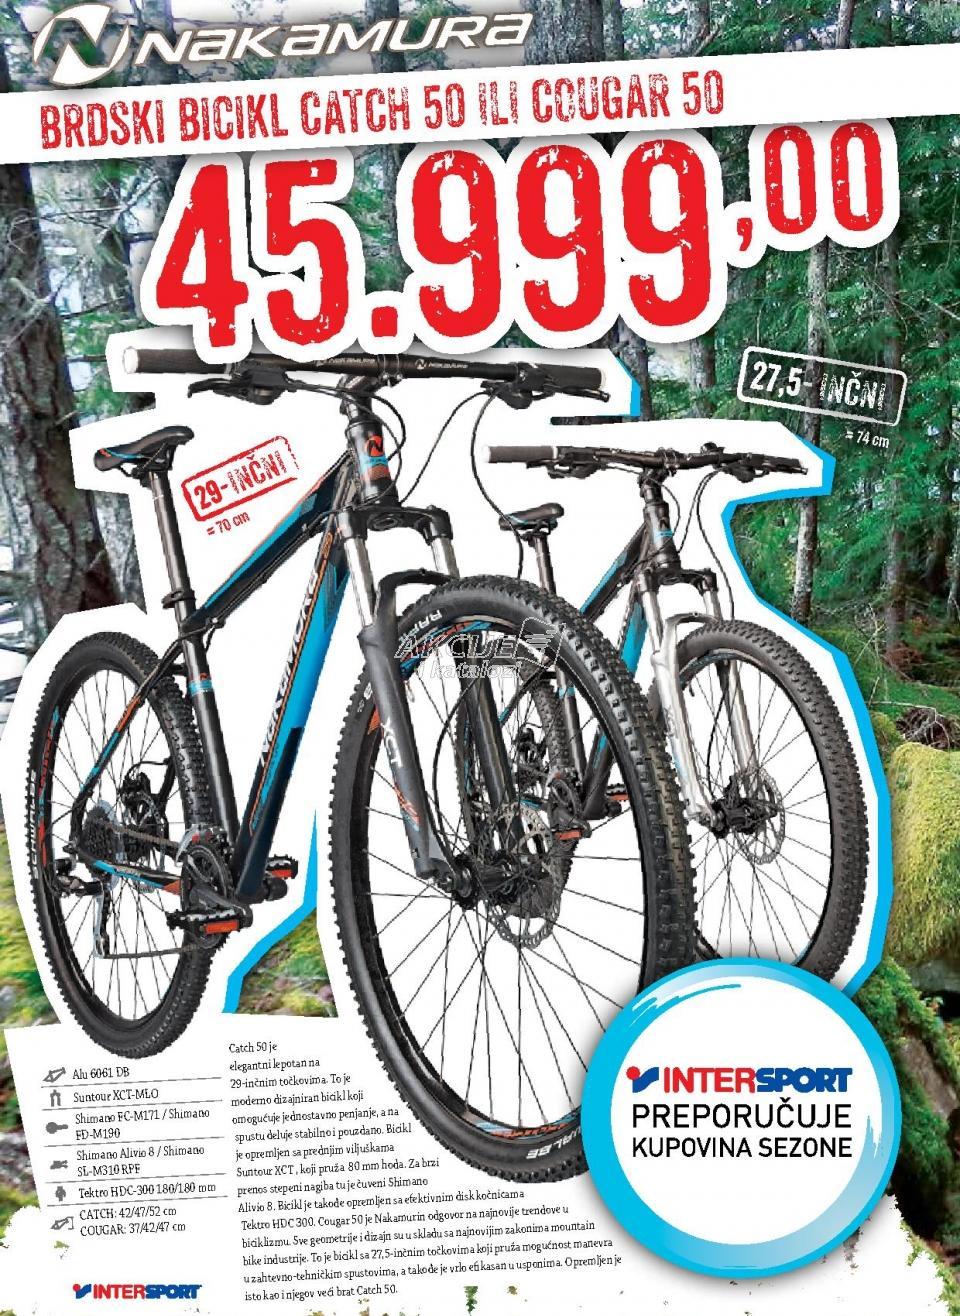 Brdski bicikl Cougar 50